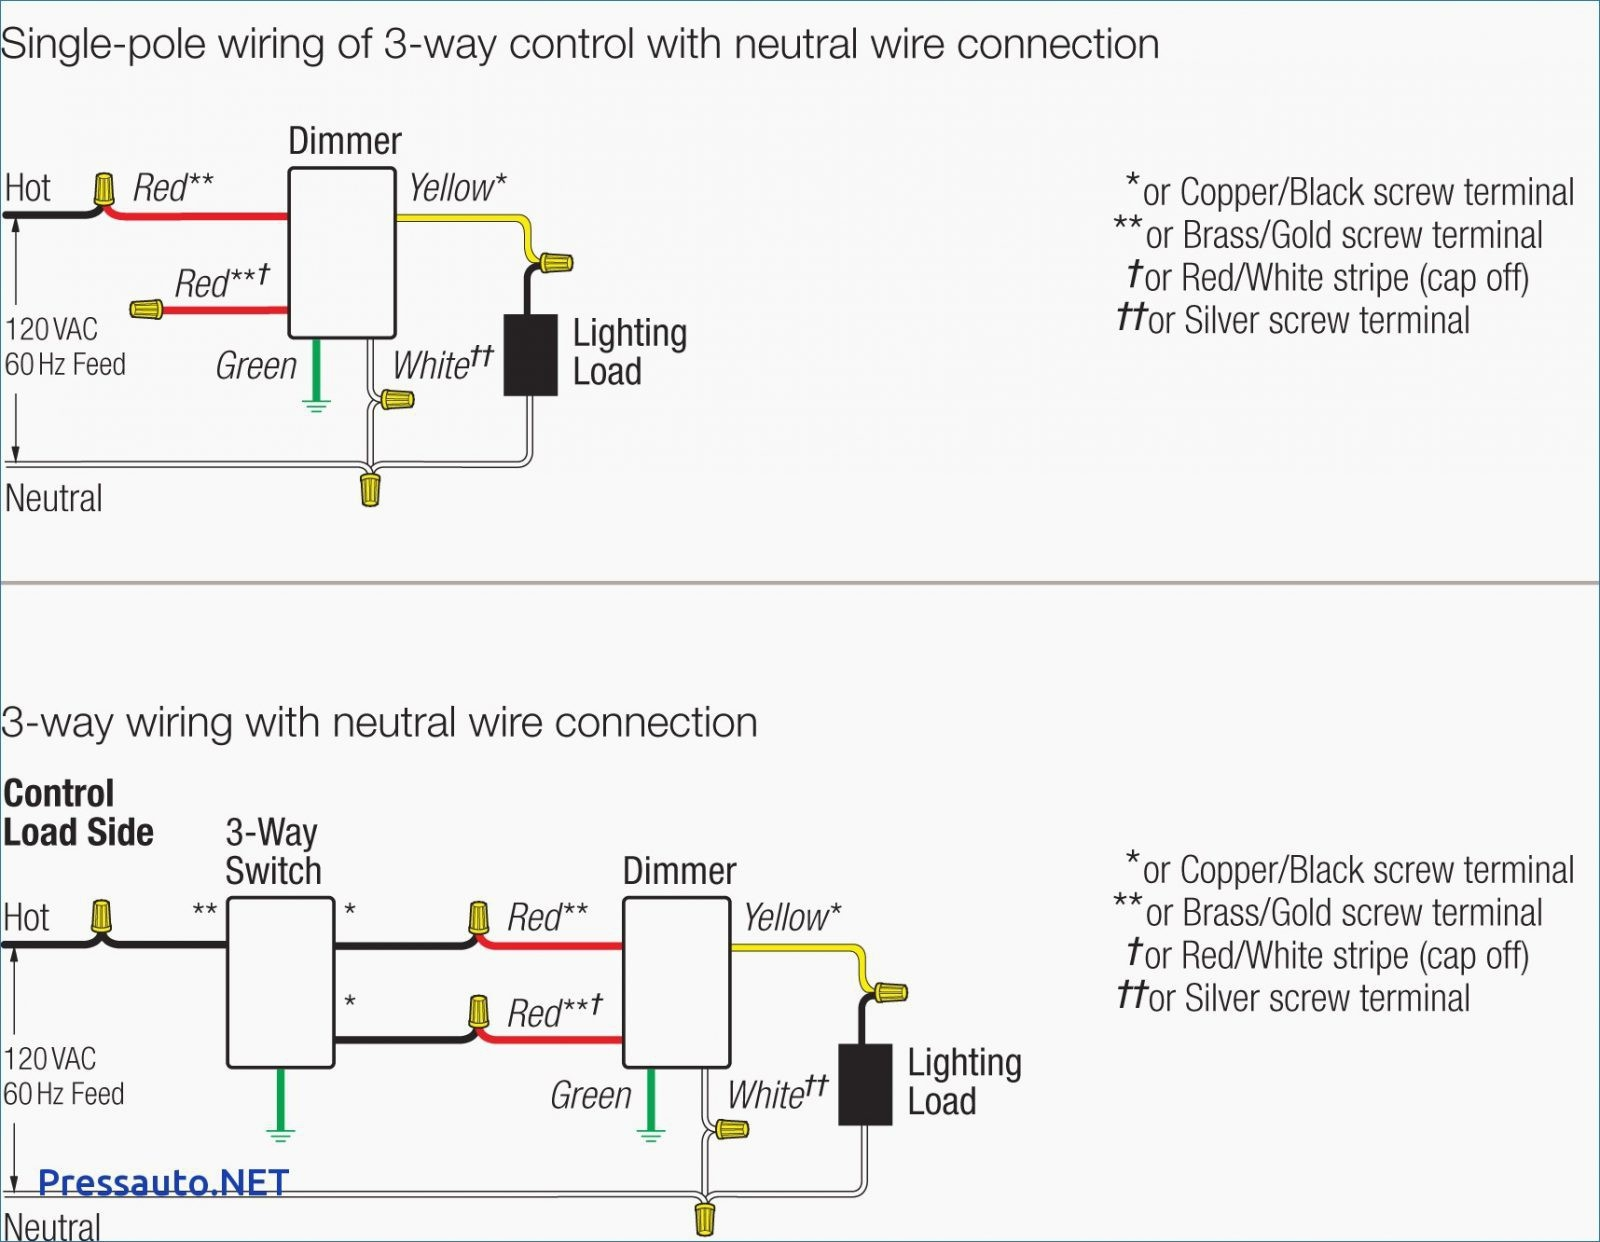 sylvania quicktronic ballast wiring diagram Download-Wiring Diagram Pics Detail Name sylvania quicktronic 3-m